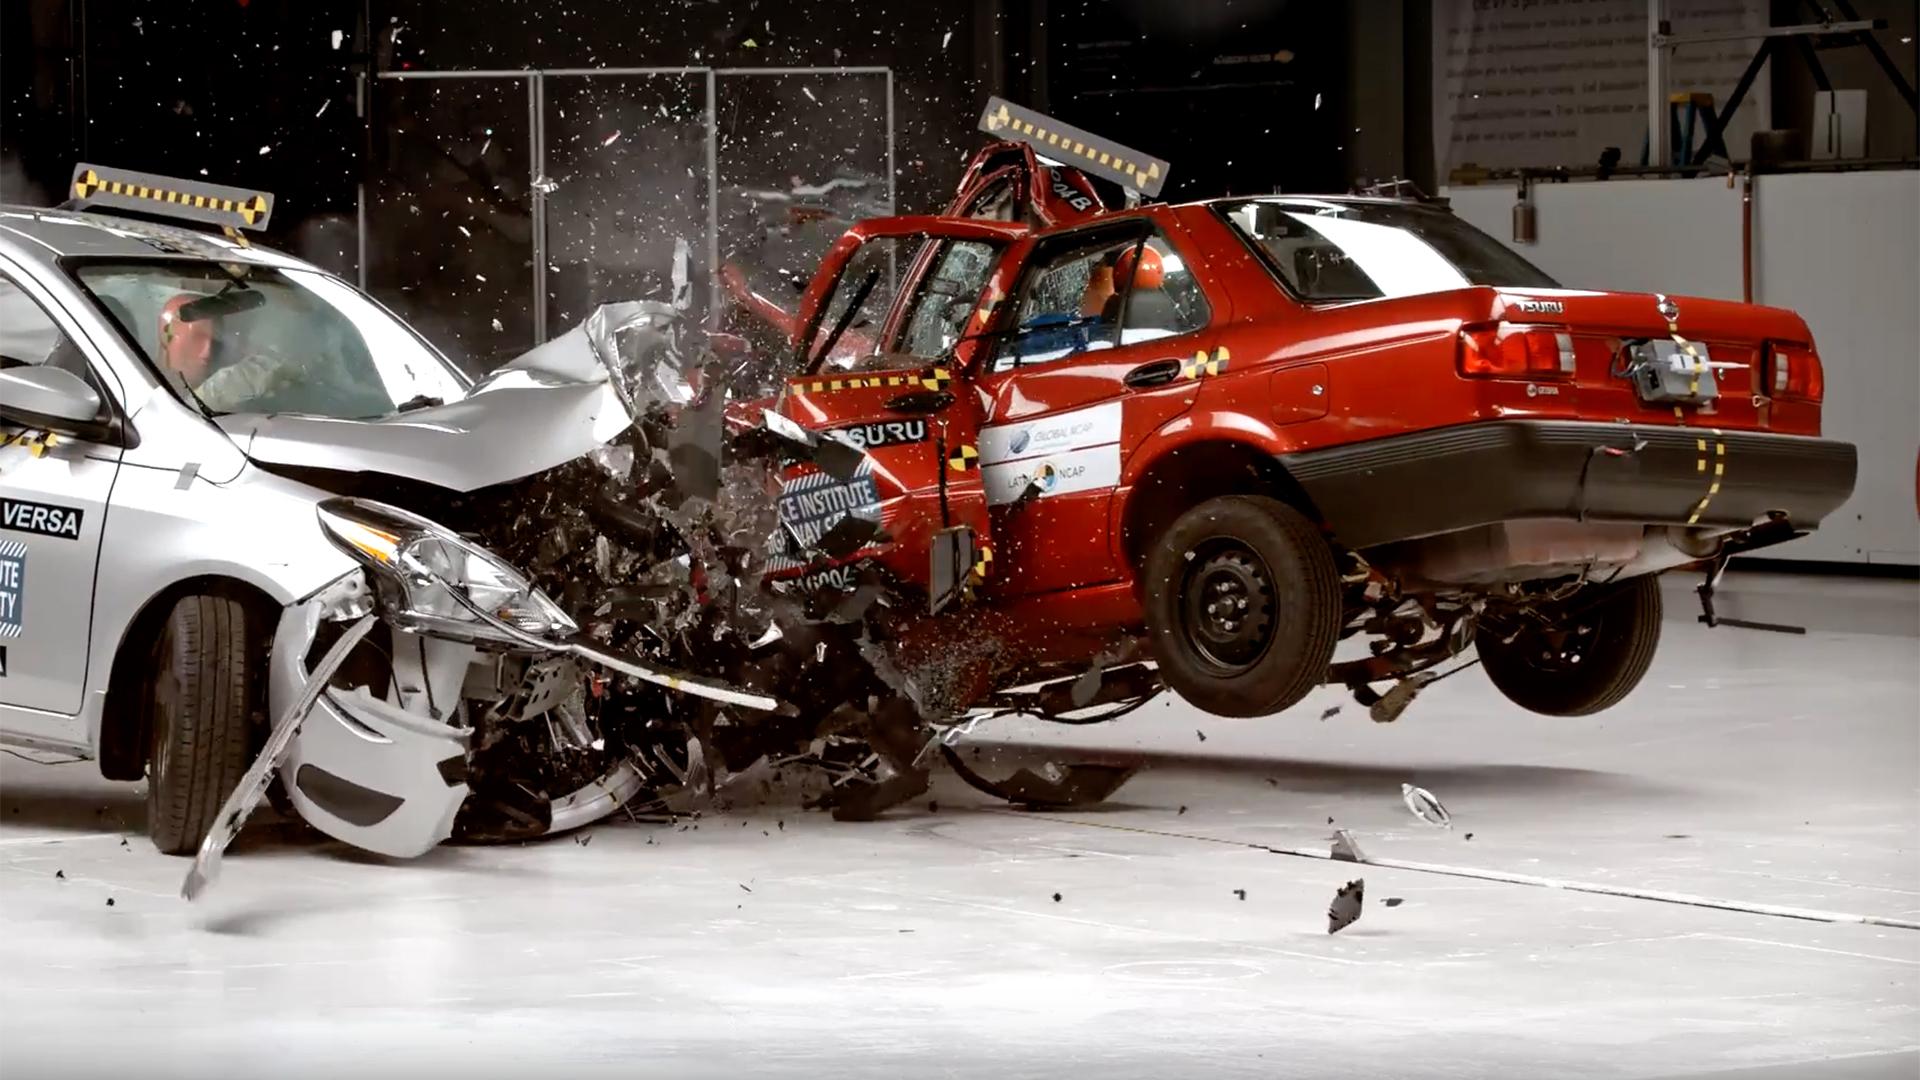 Nissan Tsuru Vs Sentra Crash Test Shows Why You Shouldn T